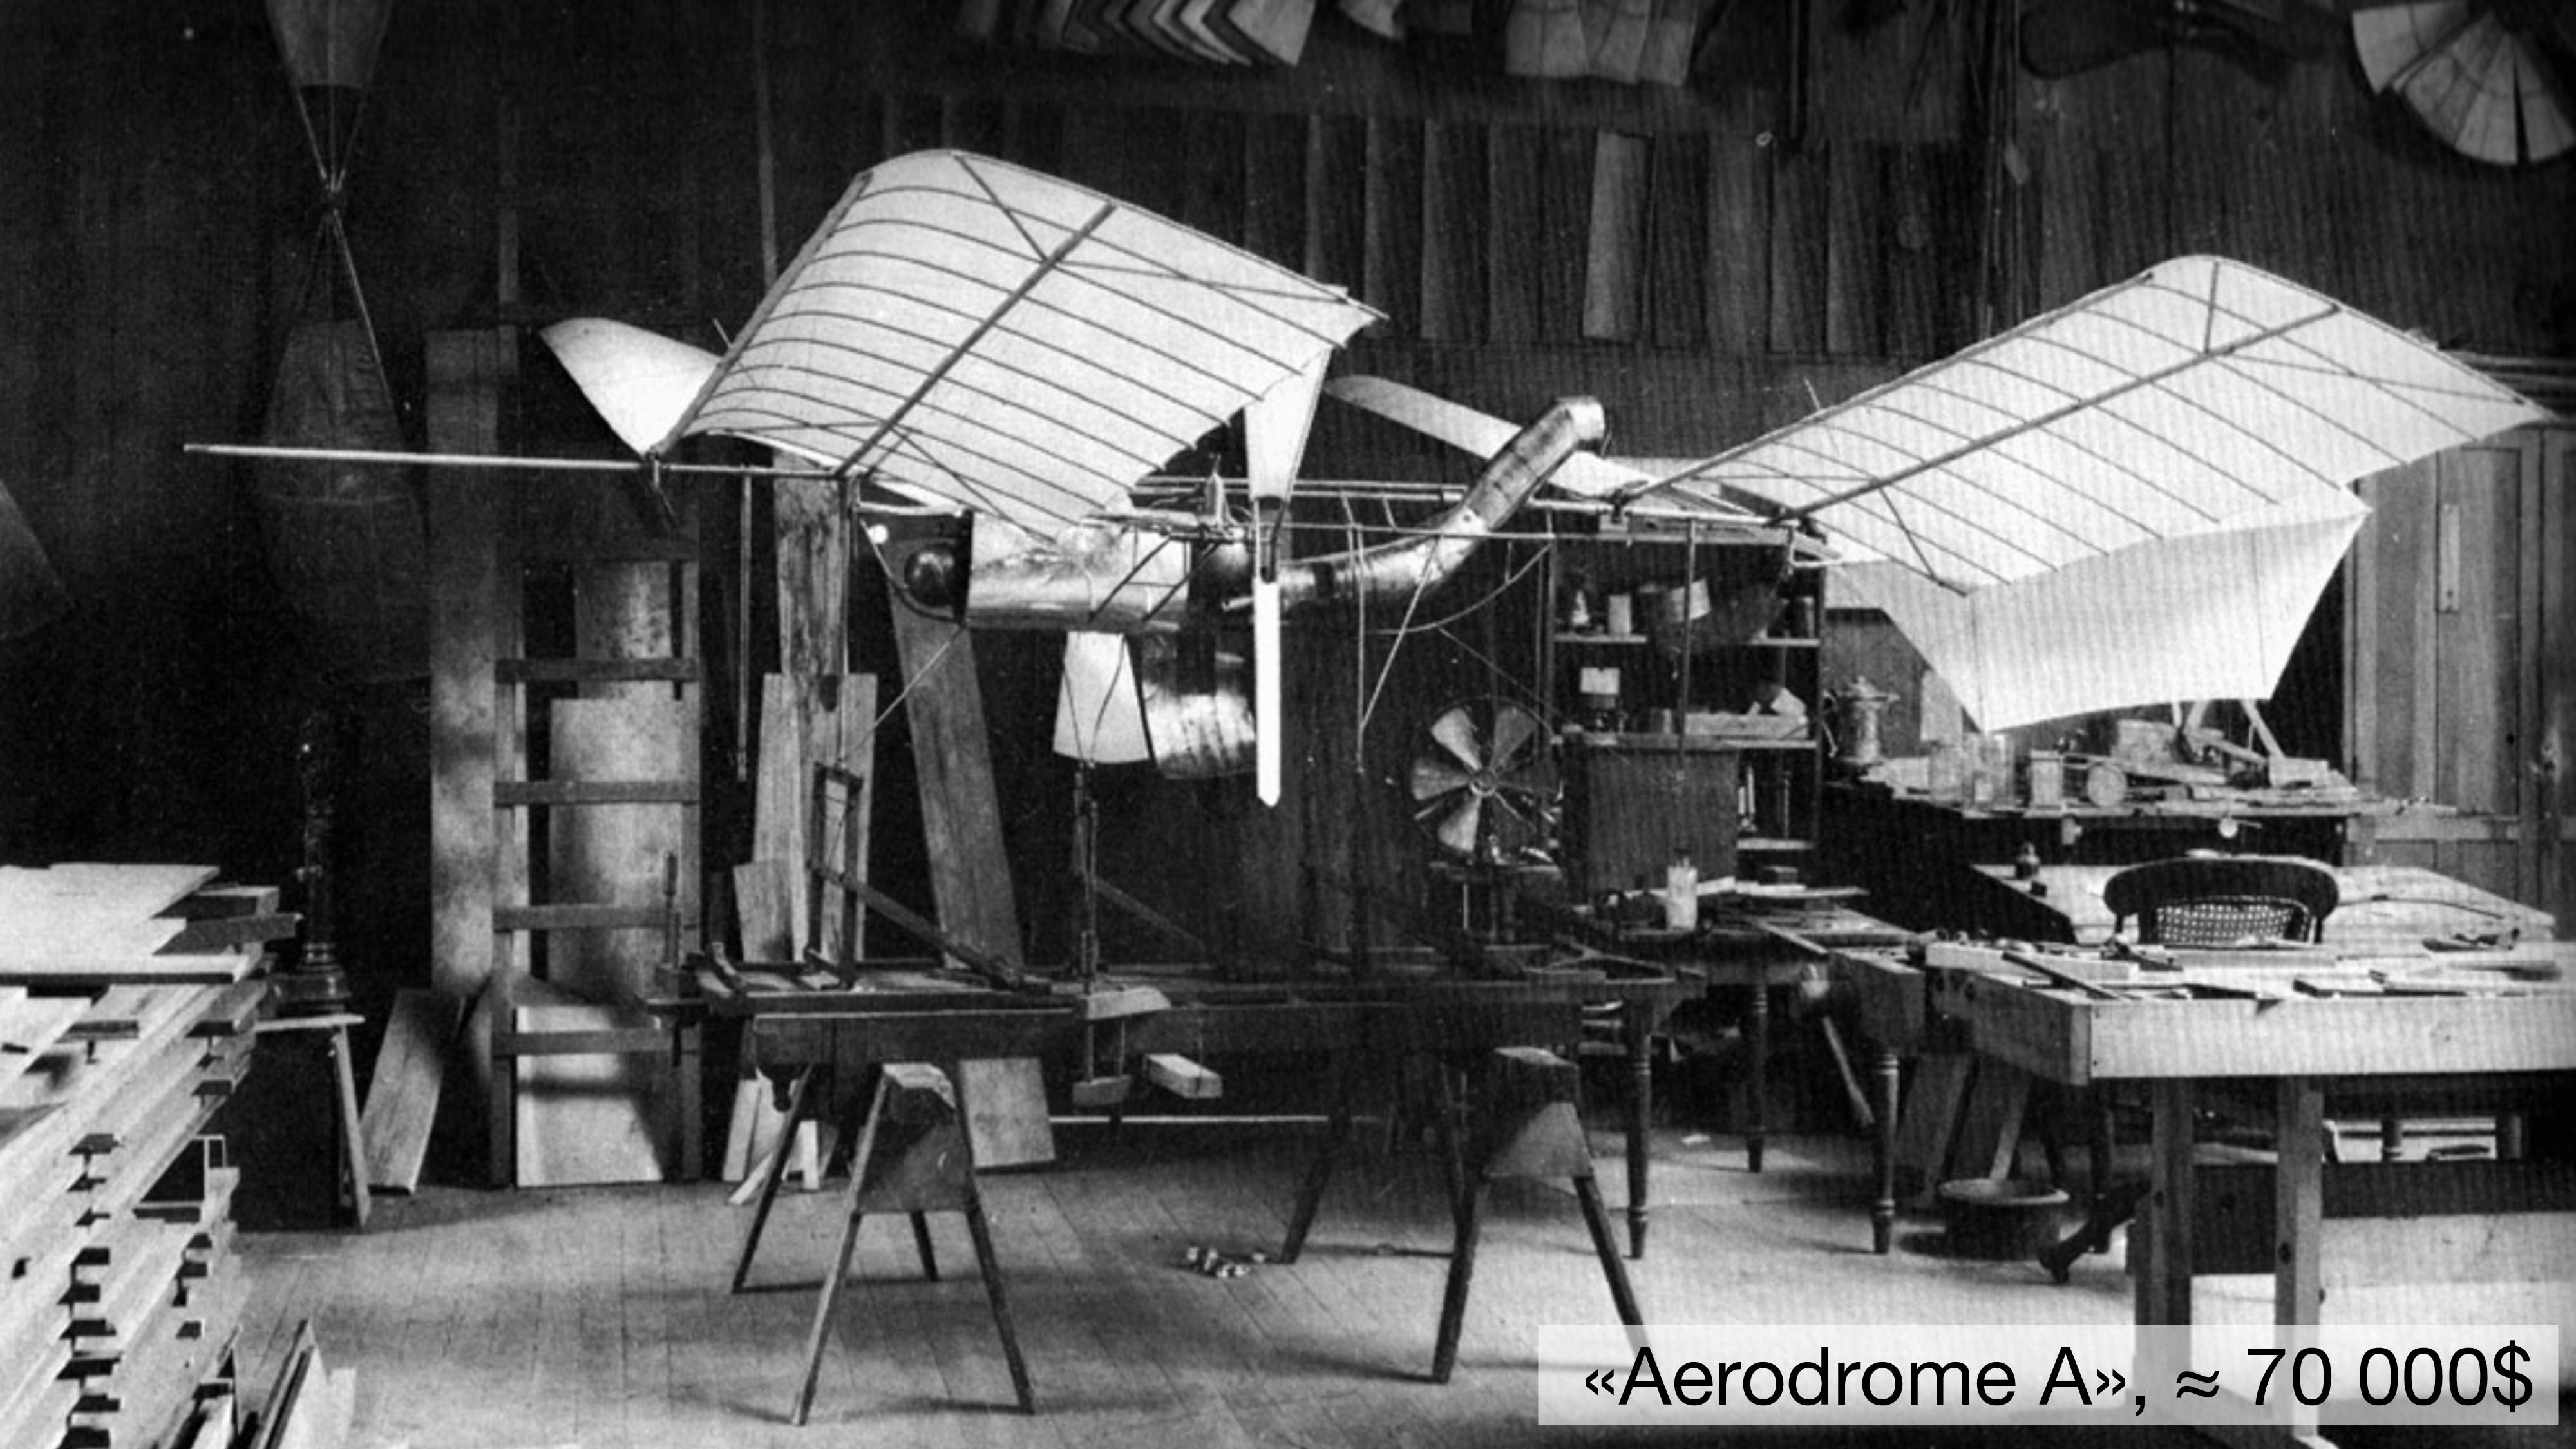 «Aerodrome A», ≈ 70 000$